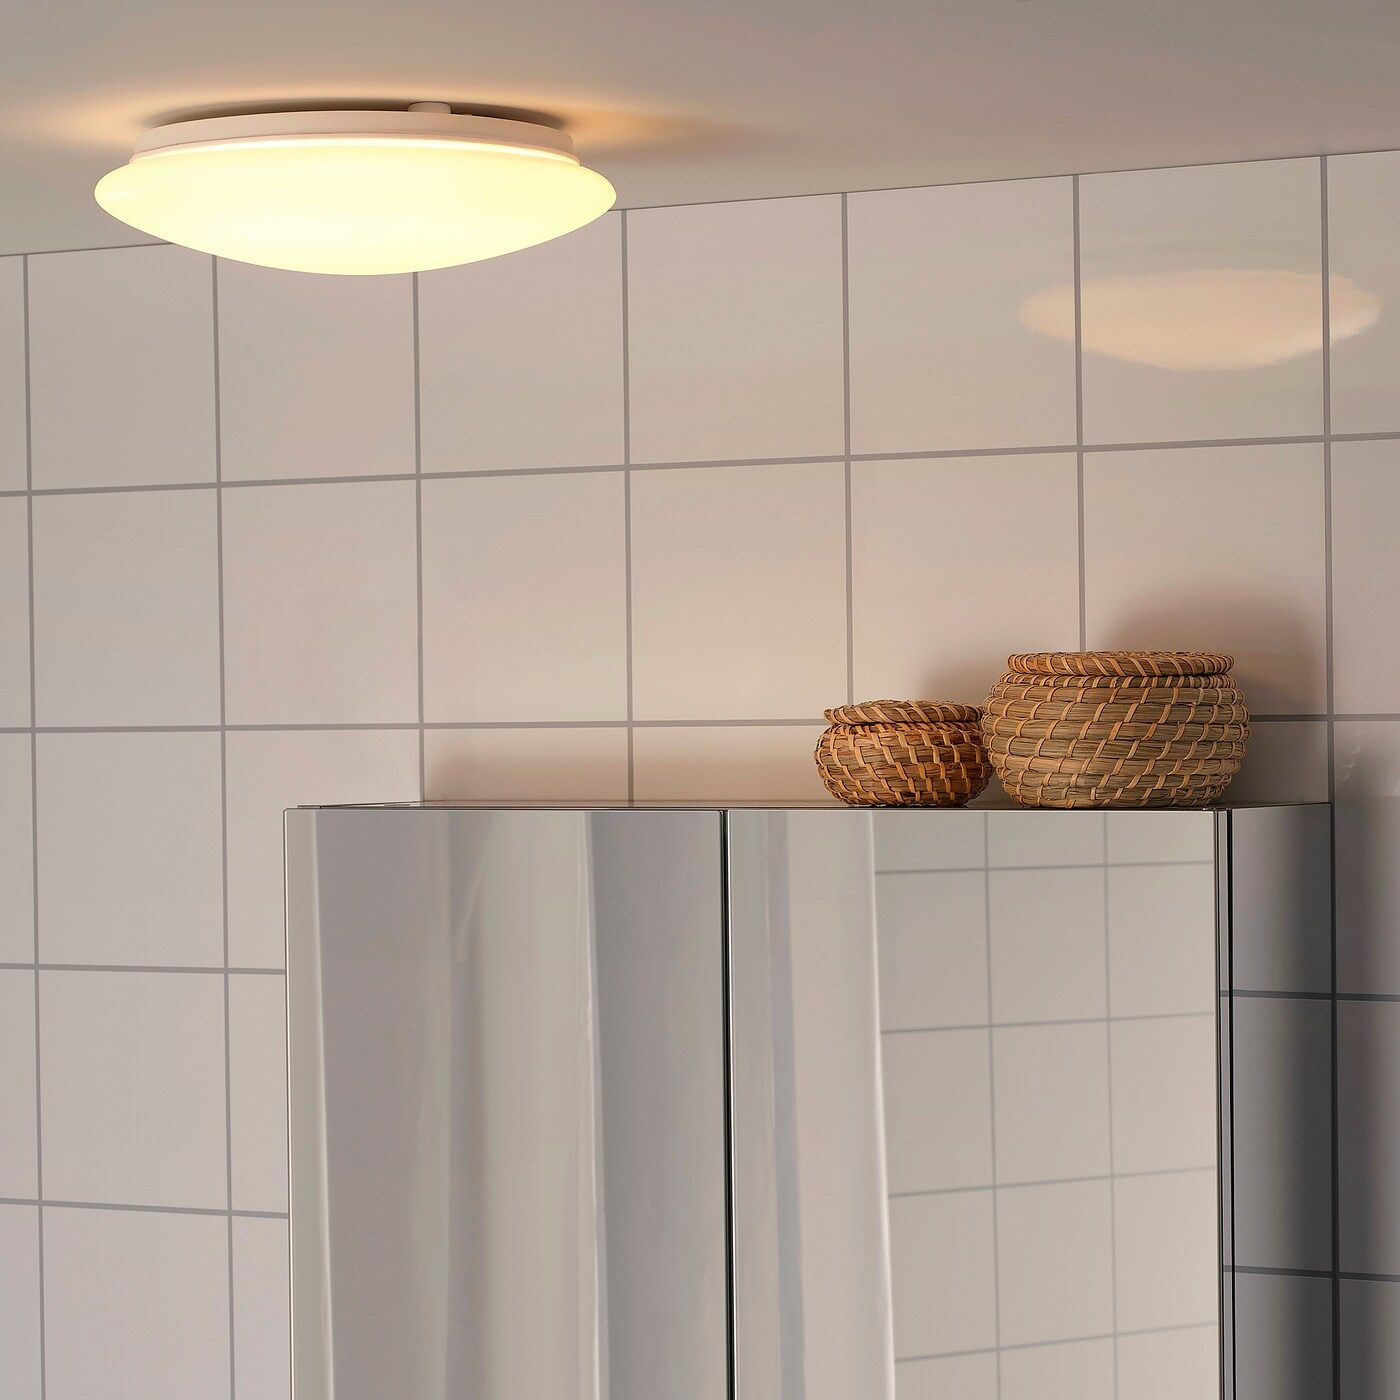 Sjogang Led Plafond Wandlamp Plafonnier Led Plafond Ikea